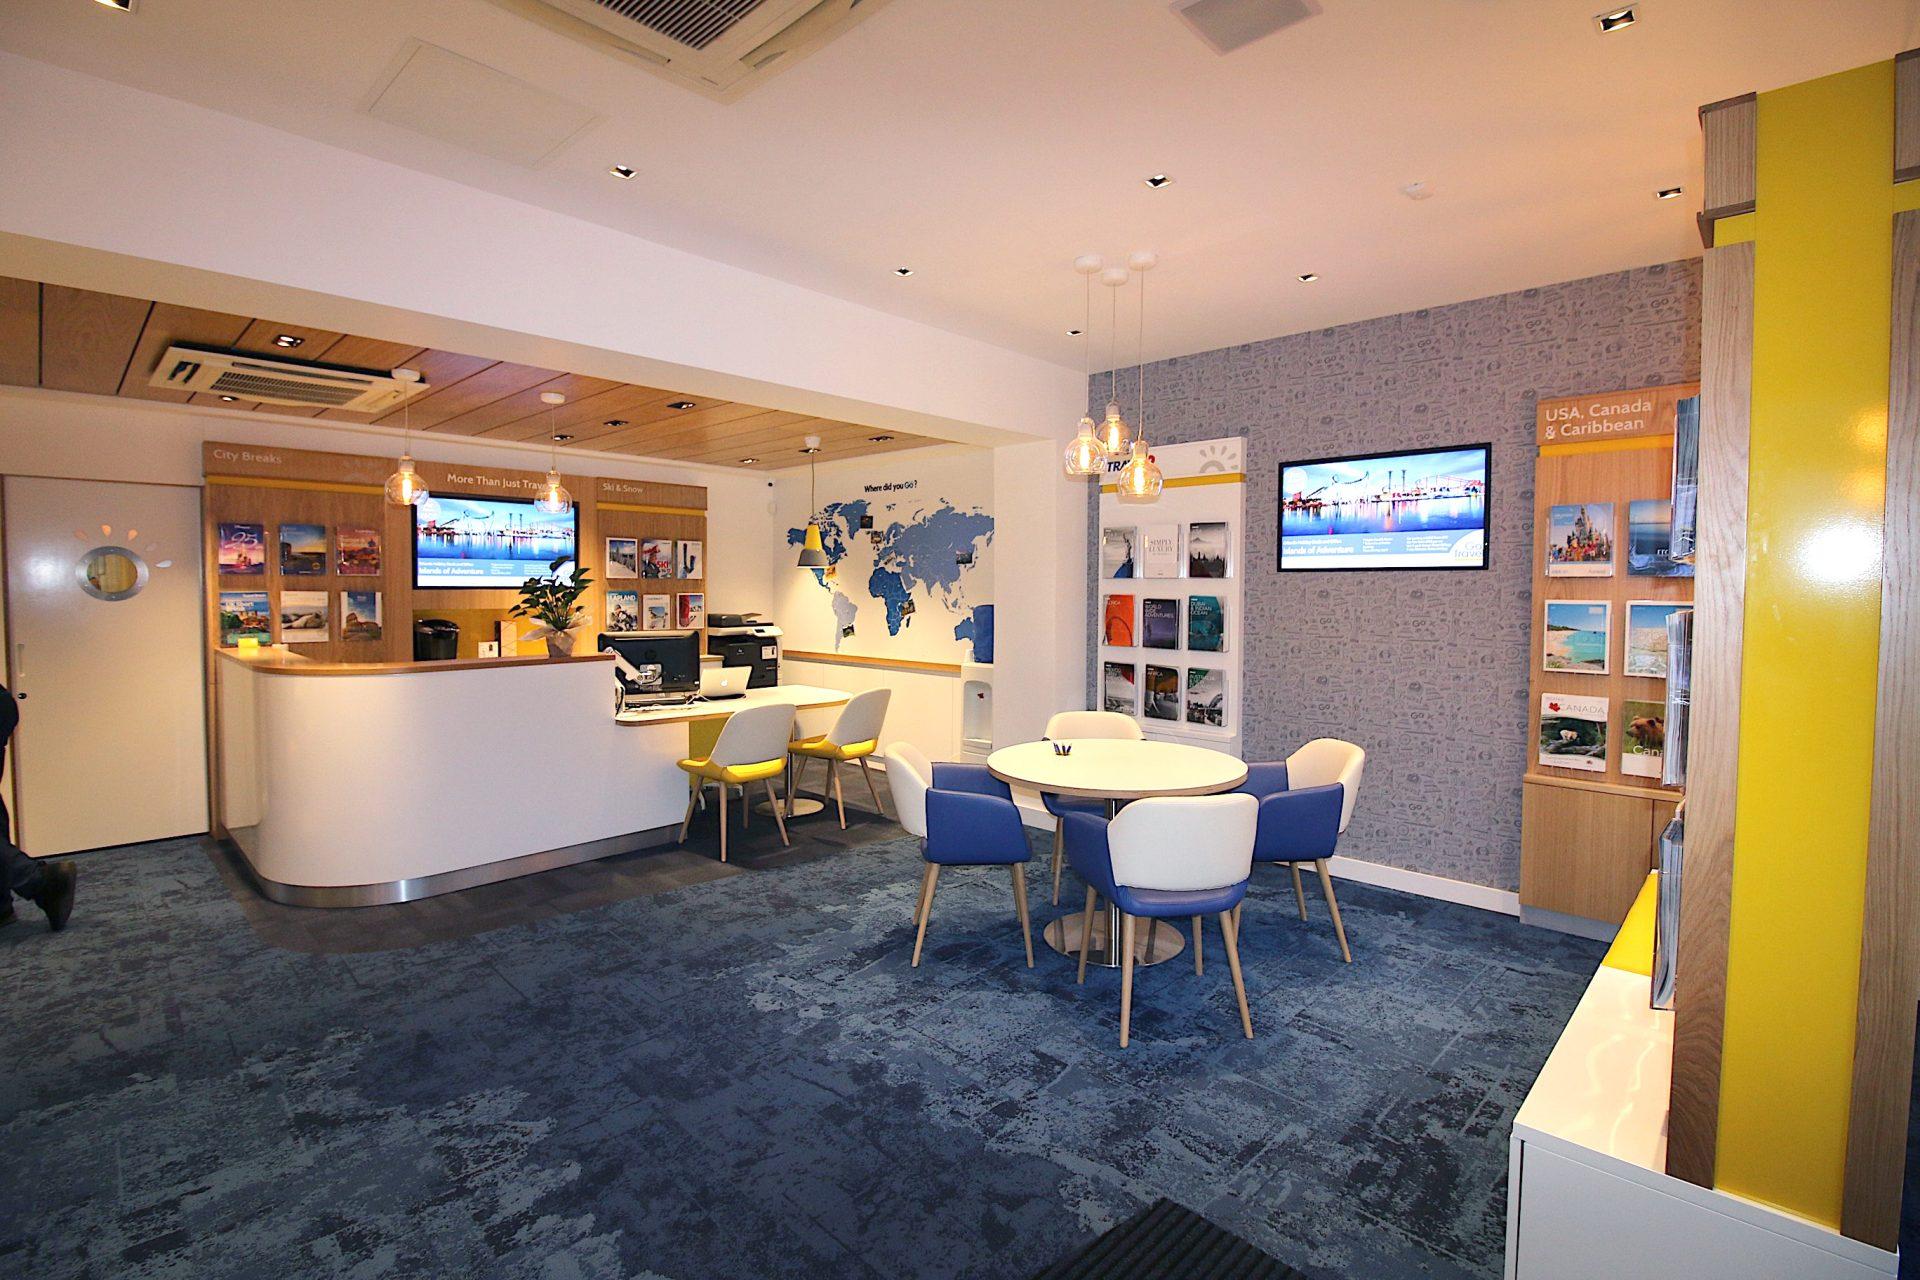 Go Travel_Chislhrust_Interior Design By Nugget Design 16